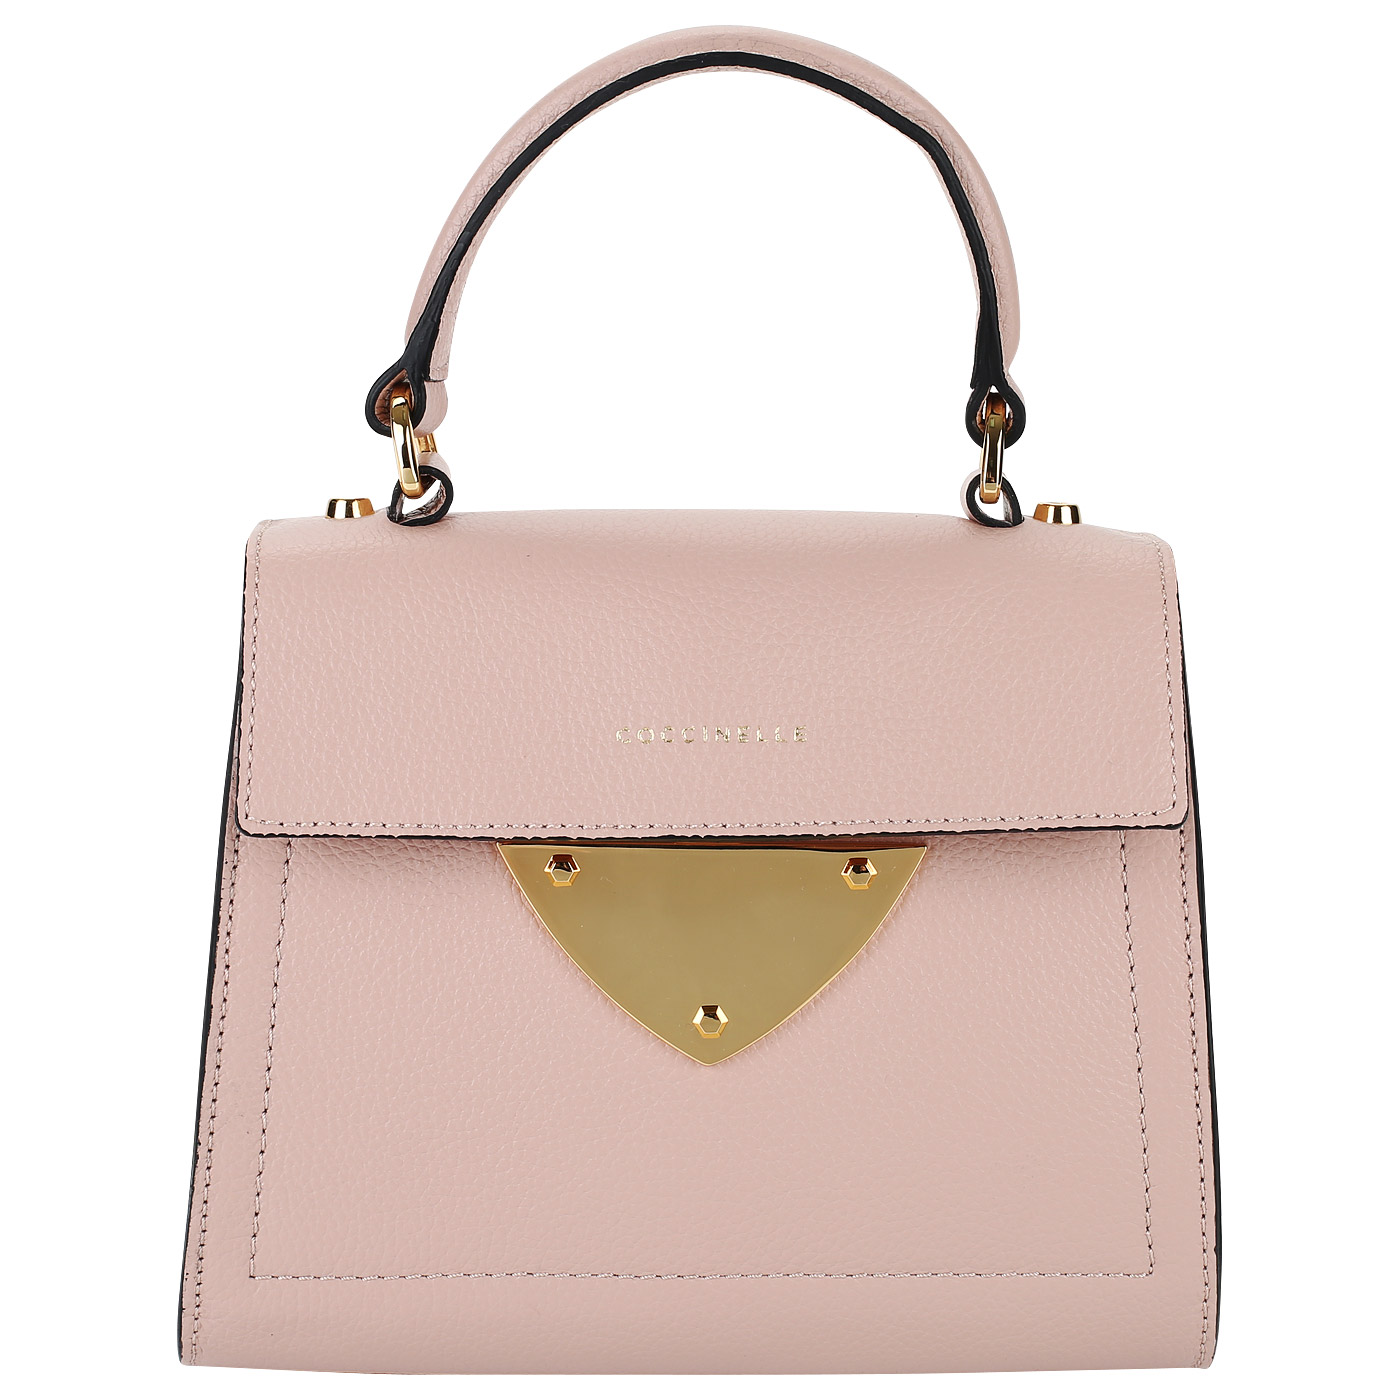 4d87f8603411 ... Женская кожаная сумочка со съемным ремешком Coccinelle B14 Lunar new  year ...